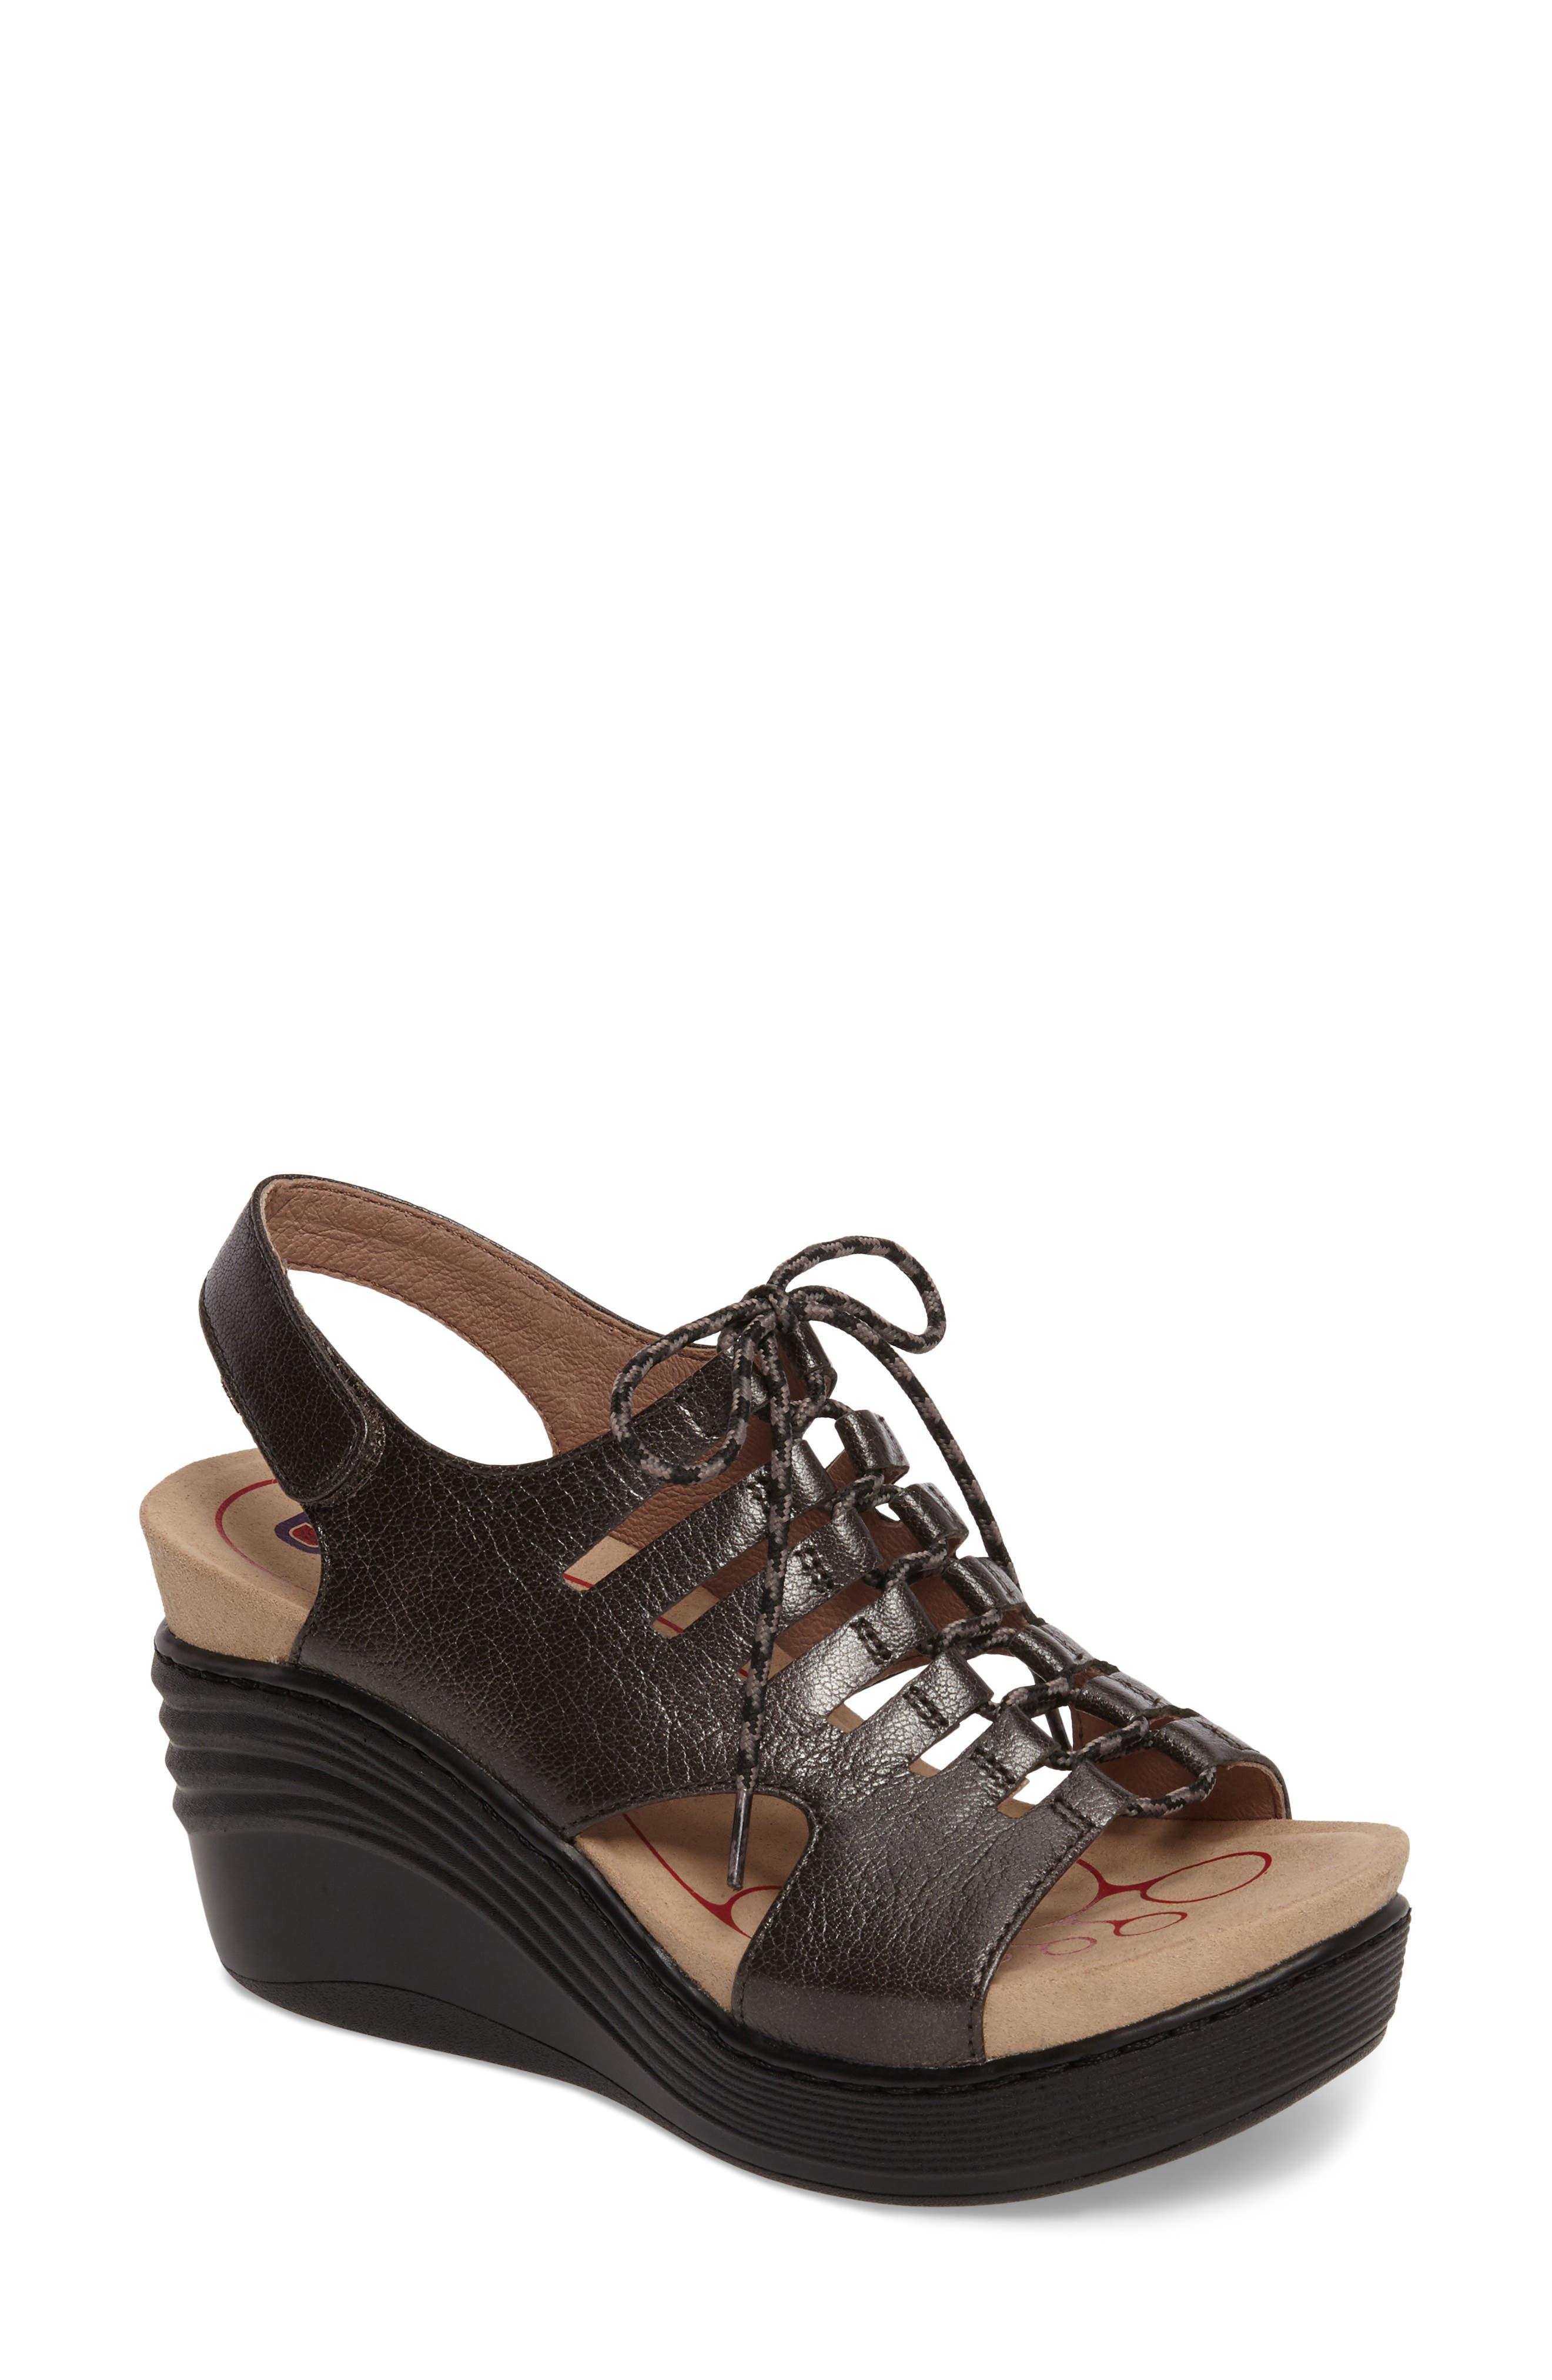 Sirus Wedge Sandal,                         Main,                         color, 040